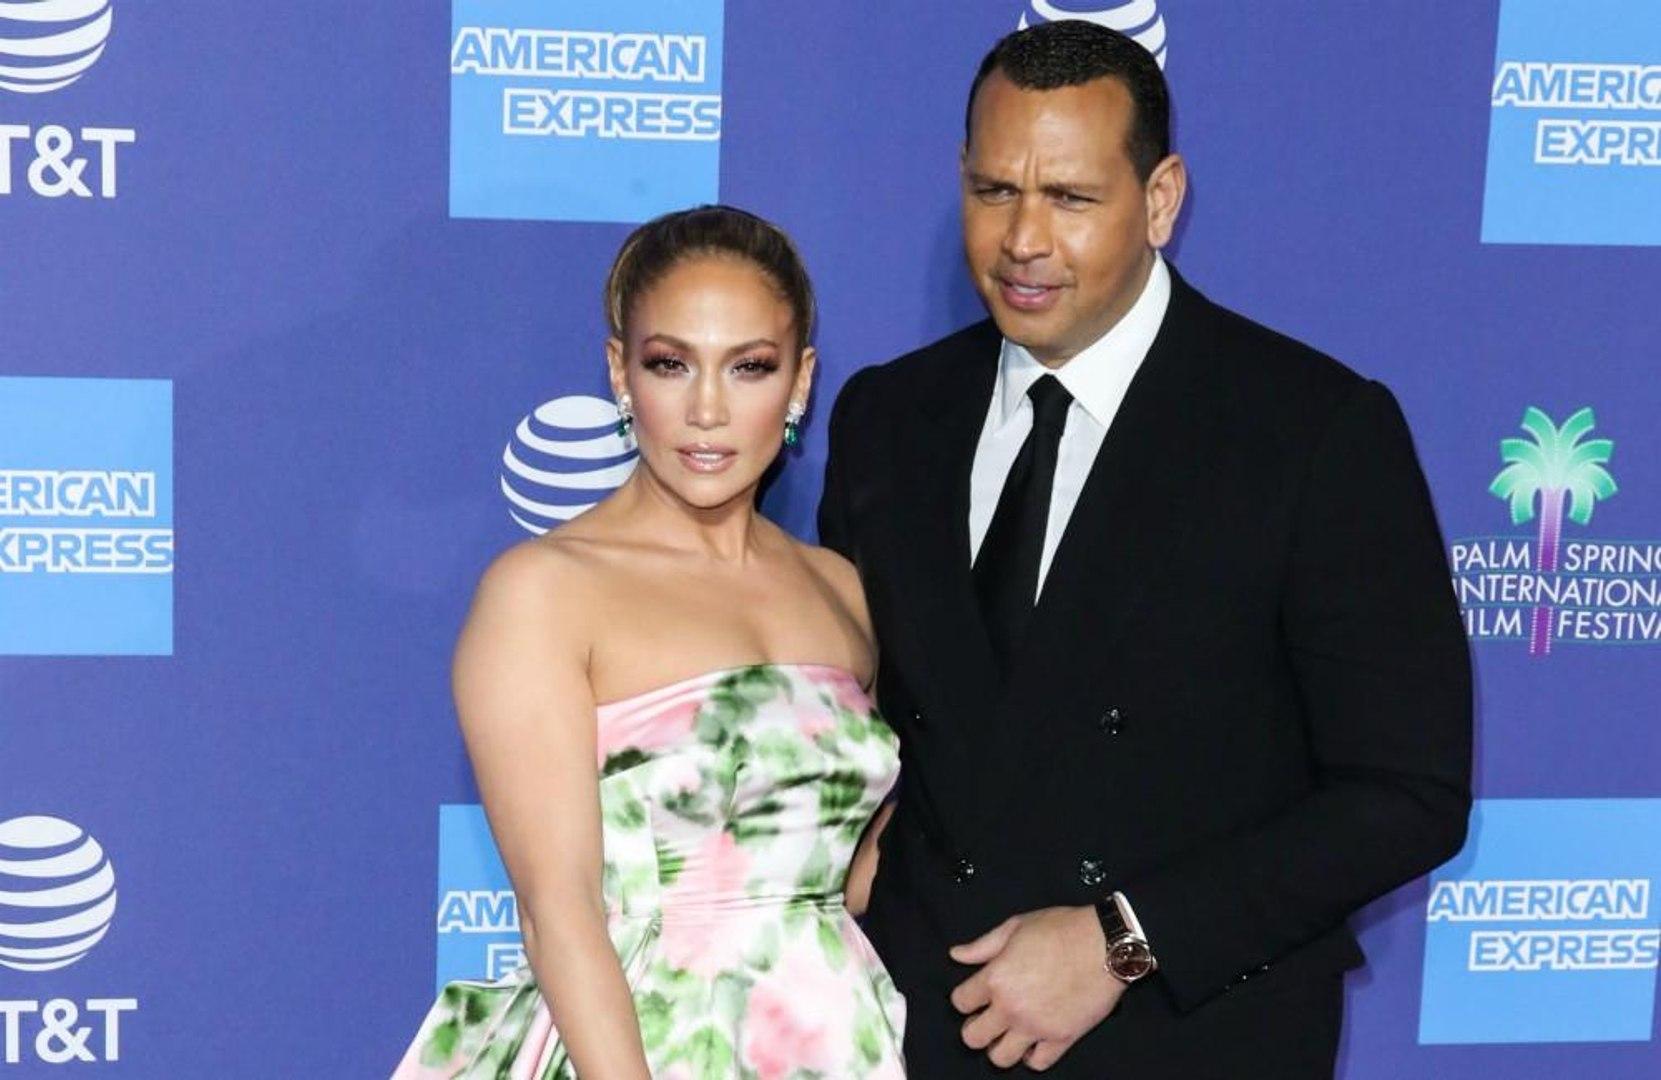 Jennifer Lopez had a 'full circle moment' when meeting Billie Eilish